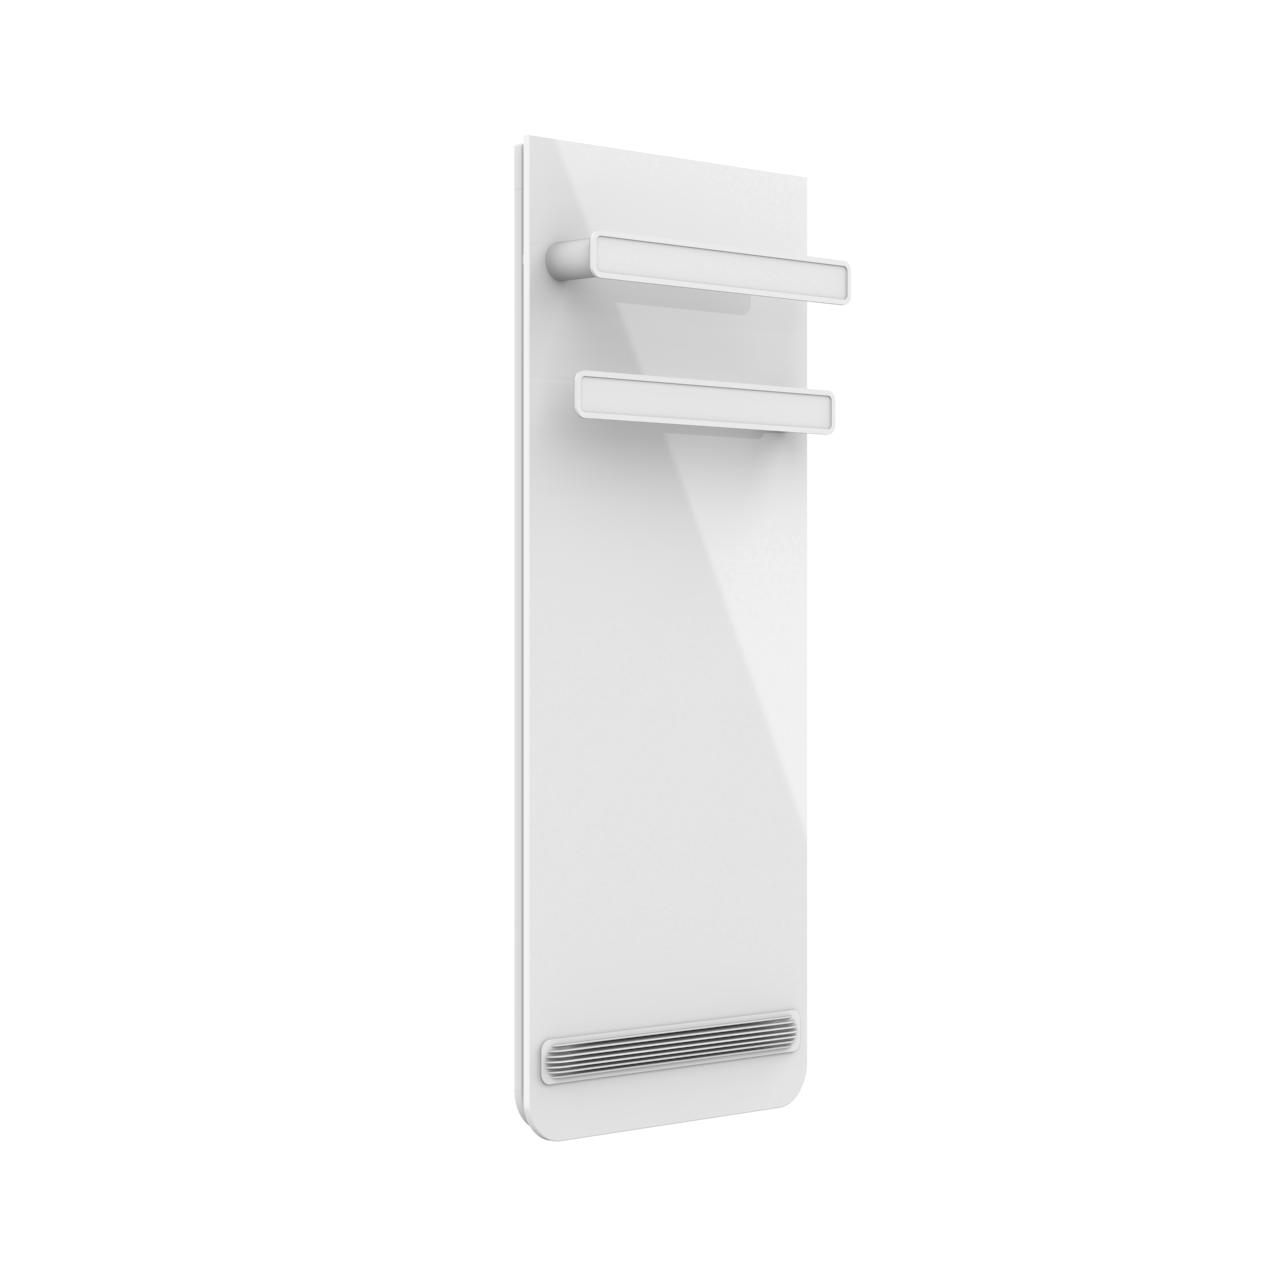 Design badkamer radiator Kyoto